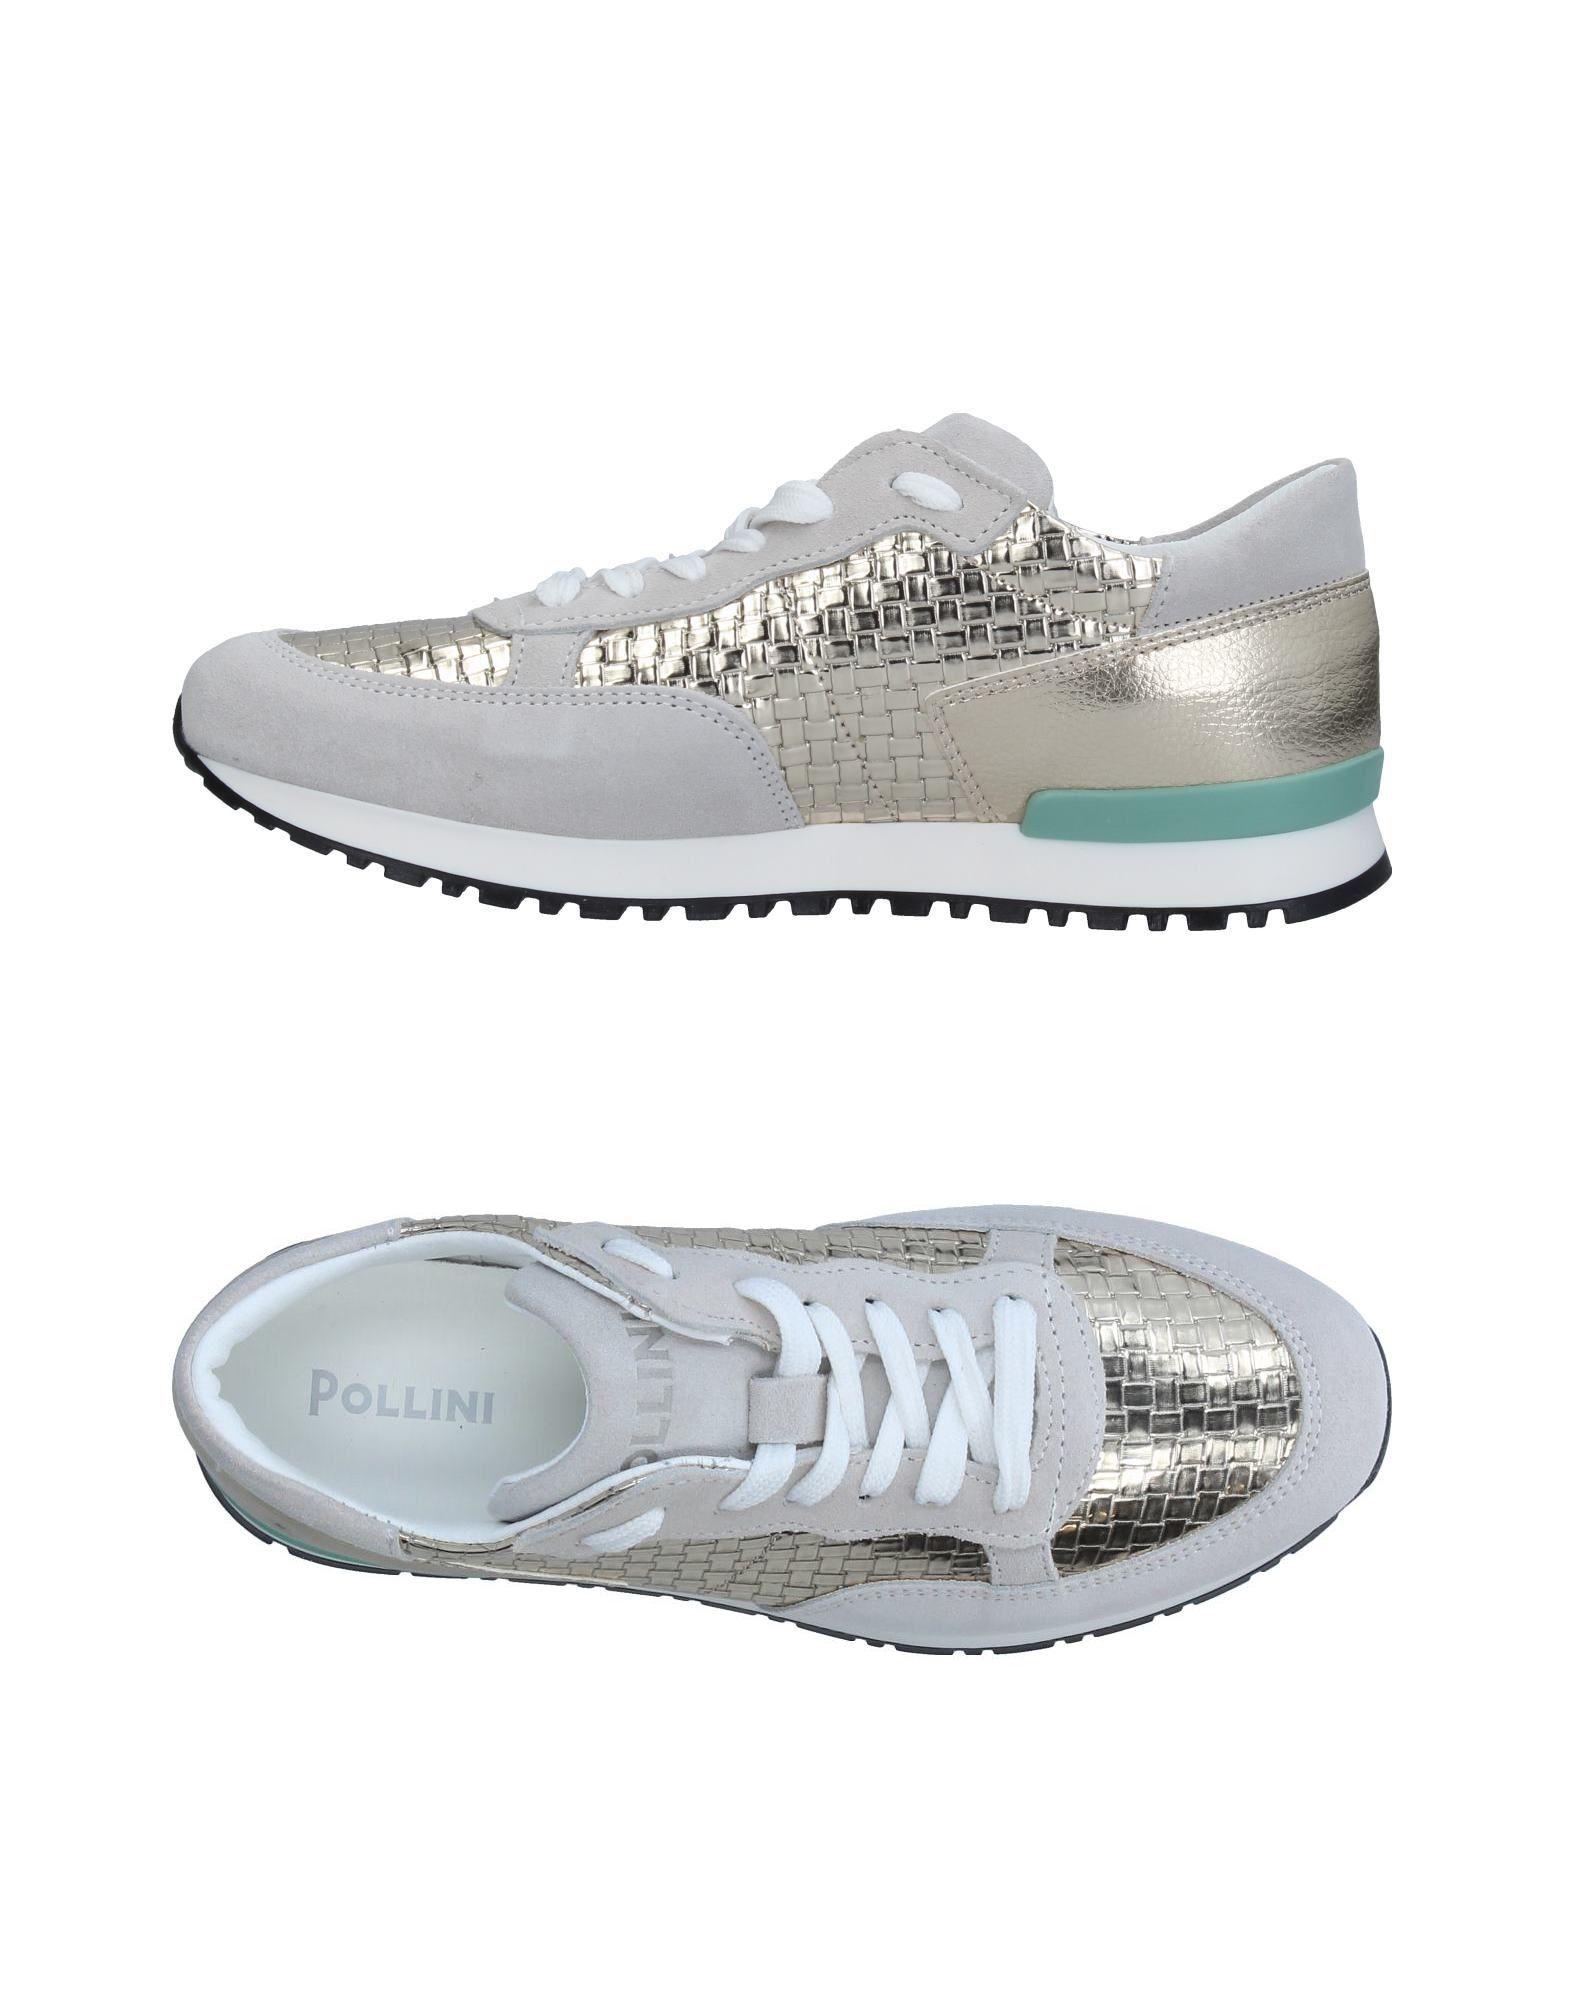 Pollini Sneakers Damen  11331241FV Gute Qualität beliebte Schuhe